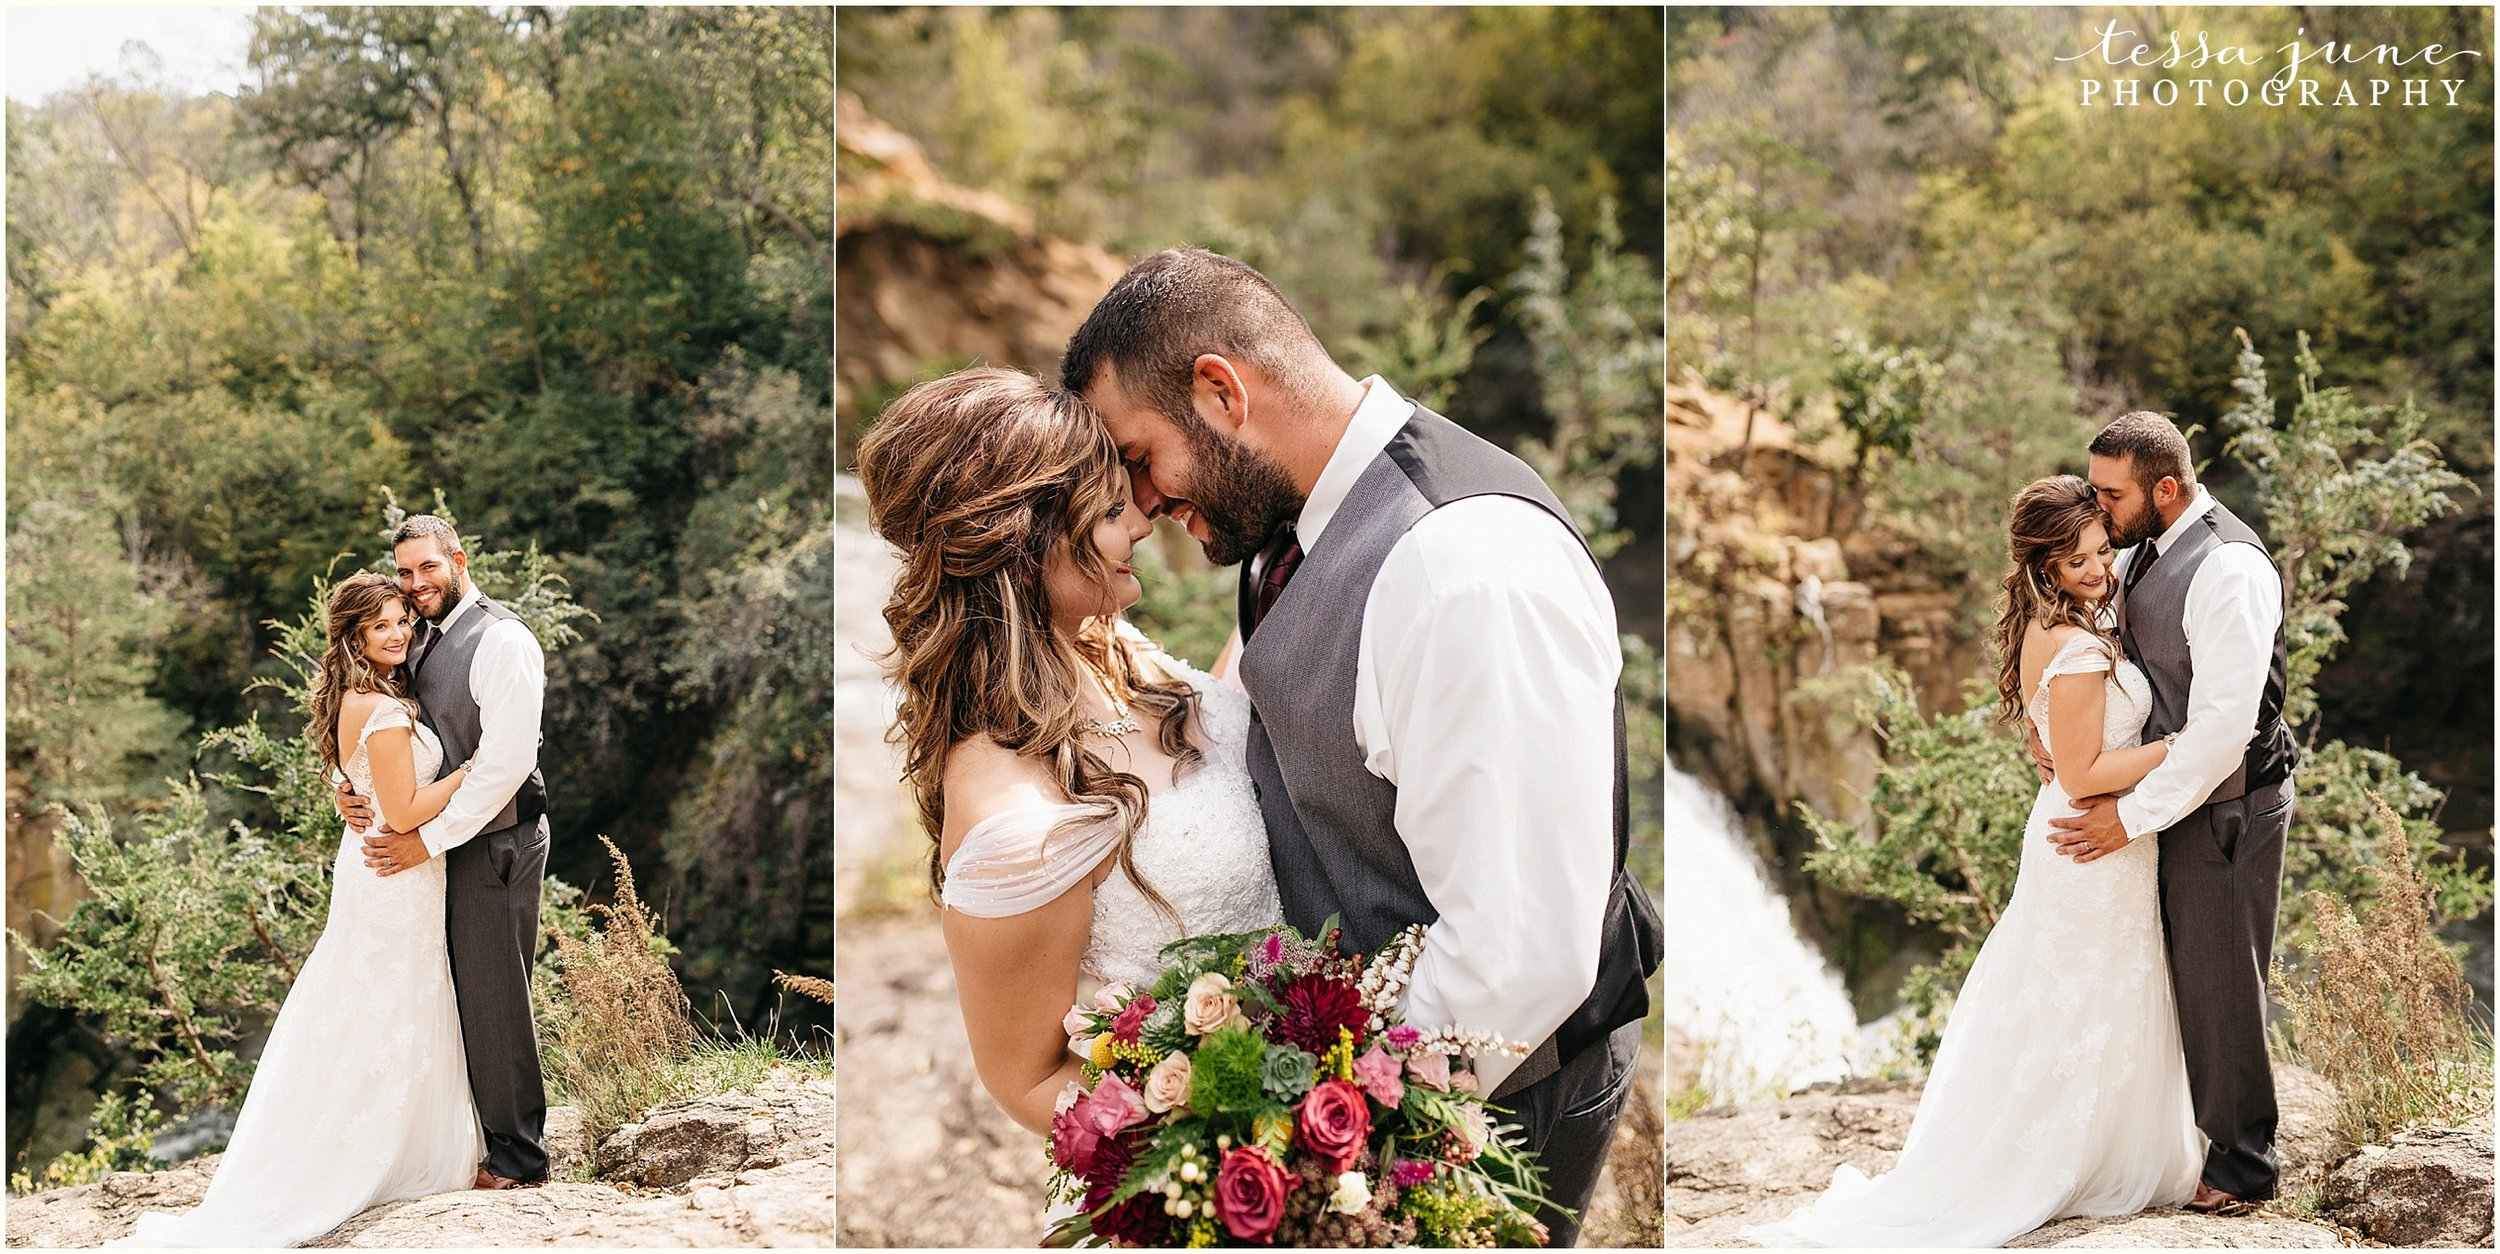 bohemian-minnesota-wedding-mismatched-bridesmaid-dresses-waterfall-st-cloud-tessa-june-photography-54.jpg